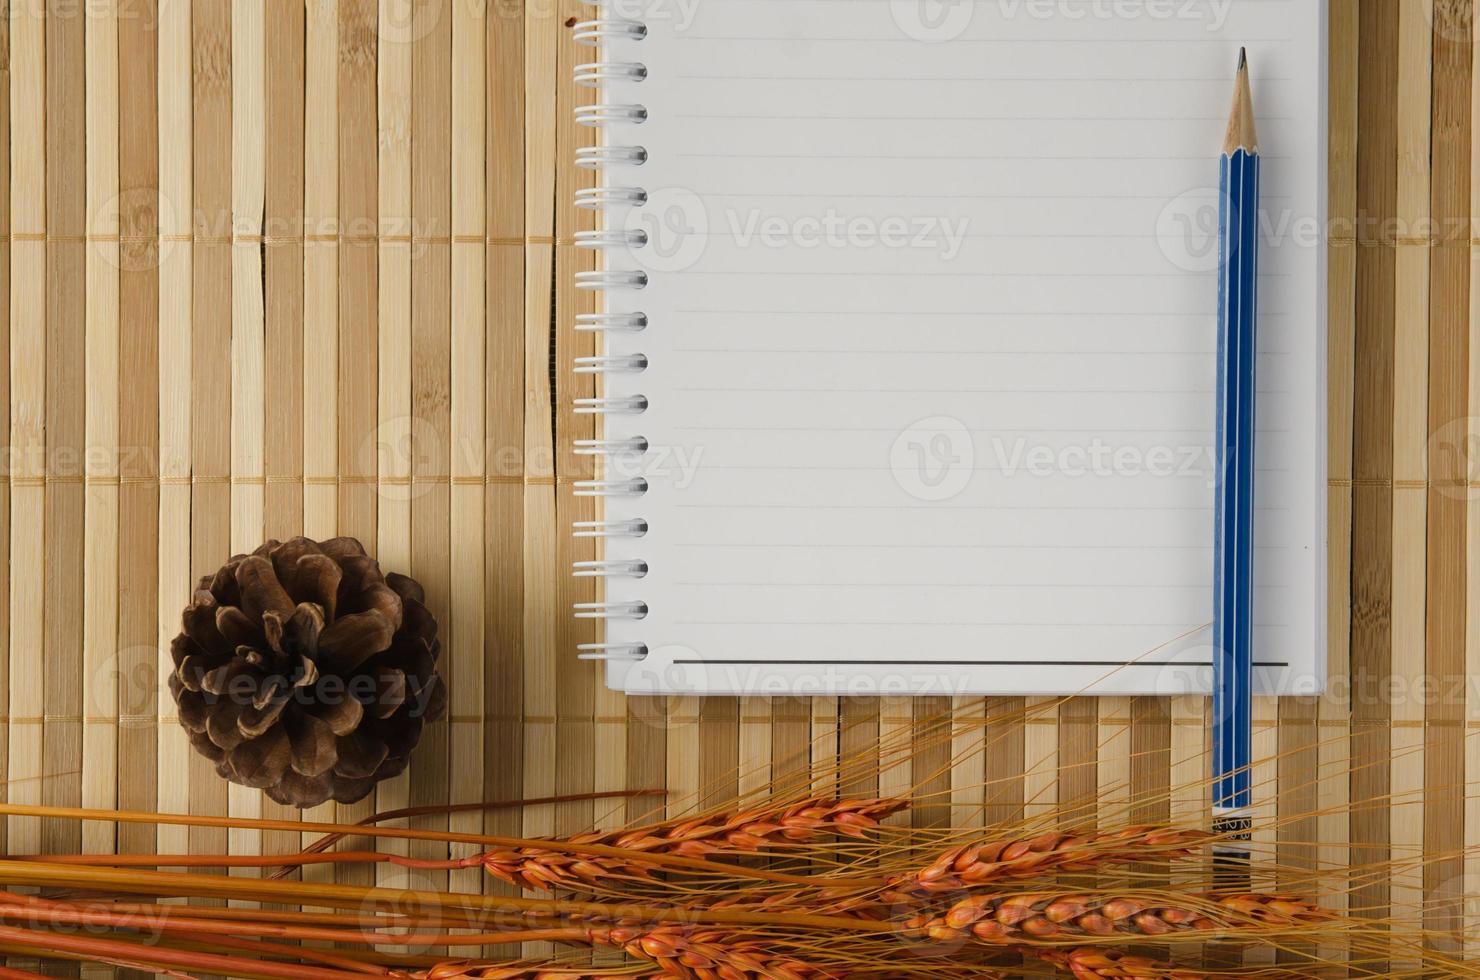 quaderno a spirale vuoto foto